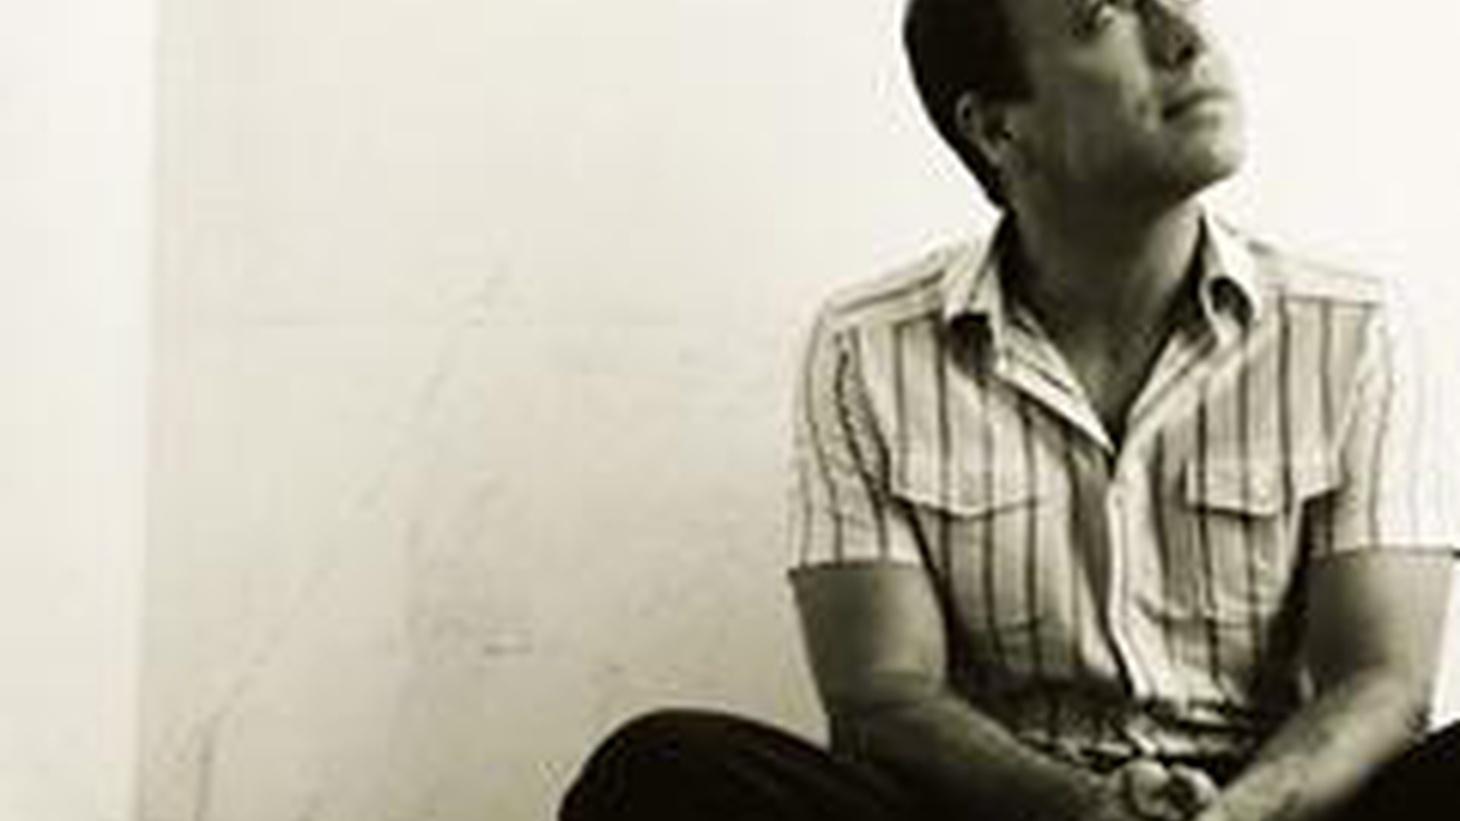 Louisiana blues guitarist Kenny Wayne Shepherd talks to Chris Douridas and performs a live set.